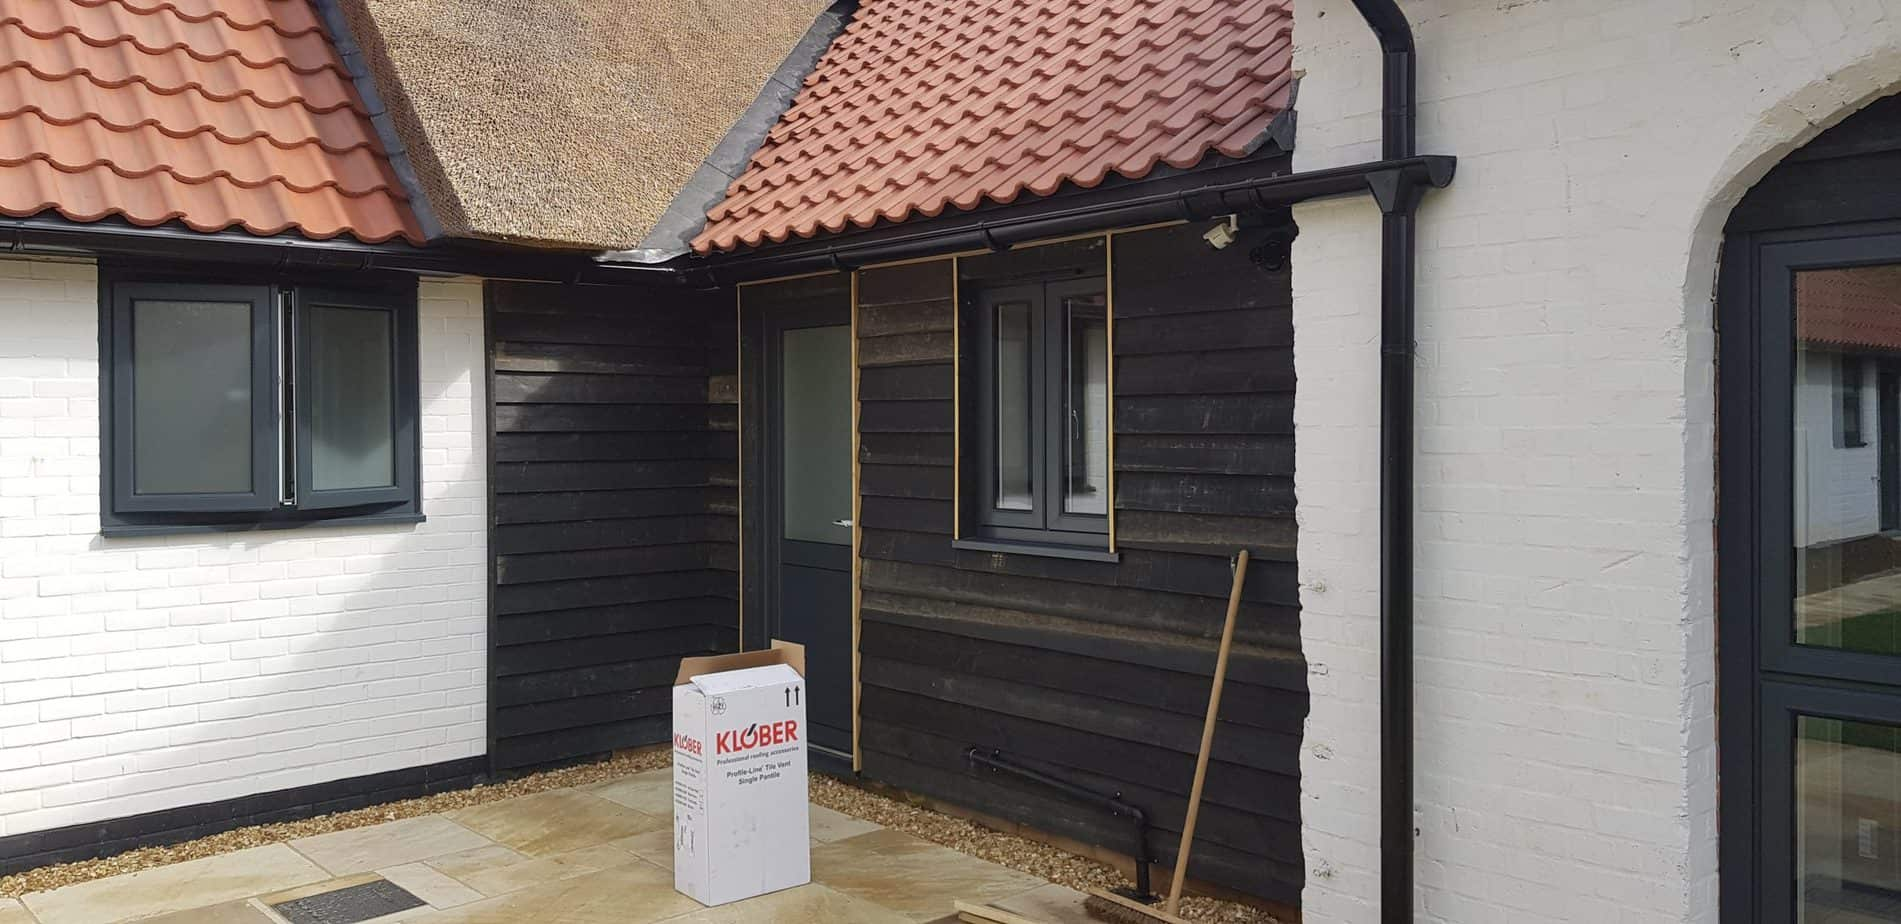 upward-barn conversions-traditional build-plot1-7-min